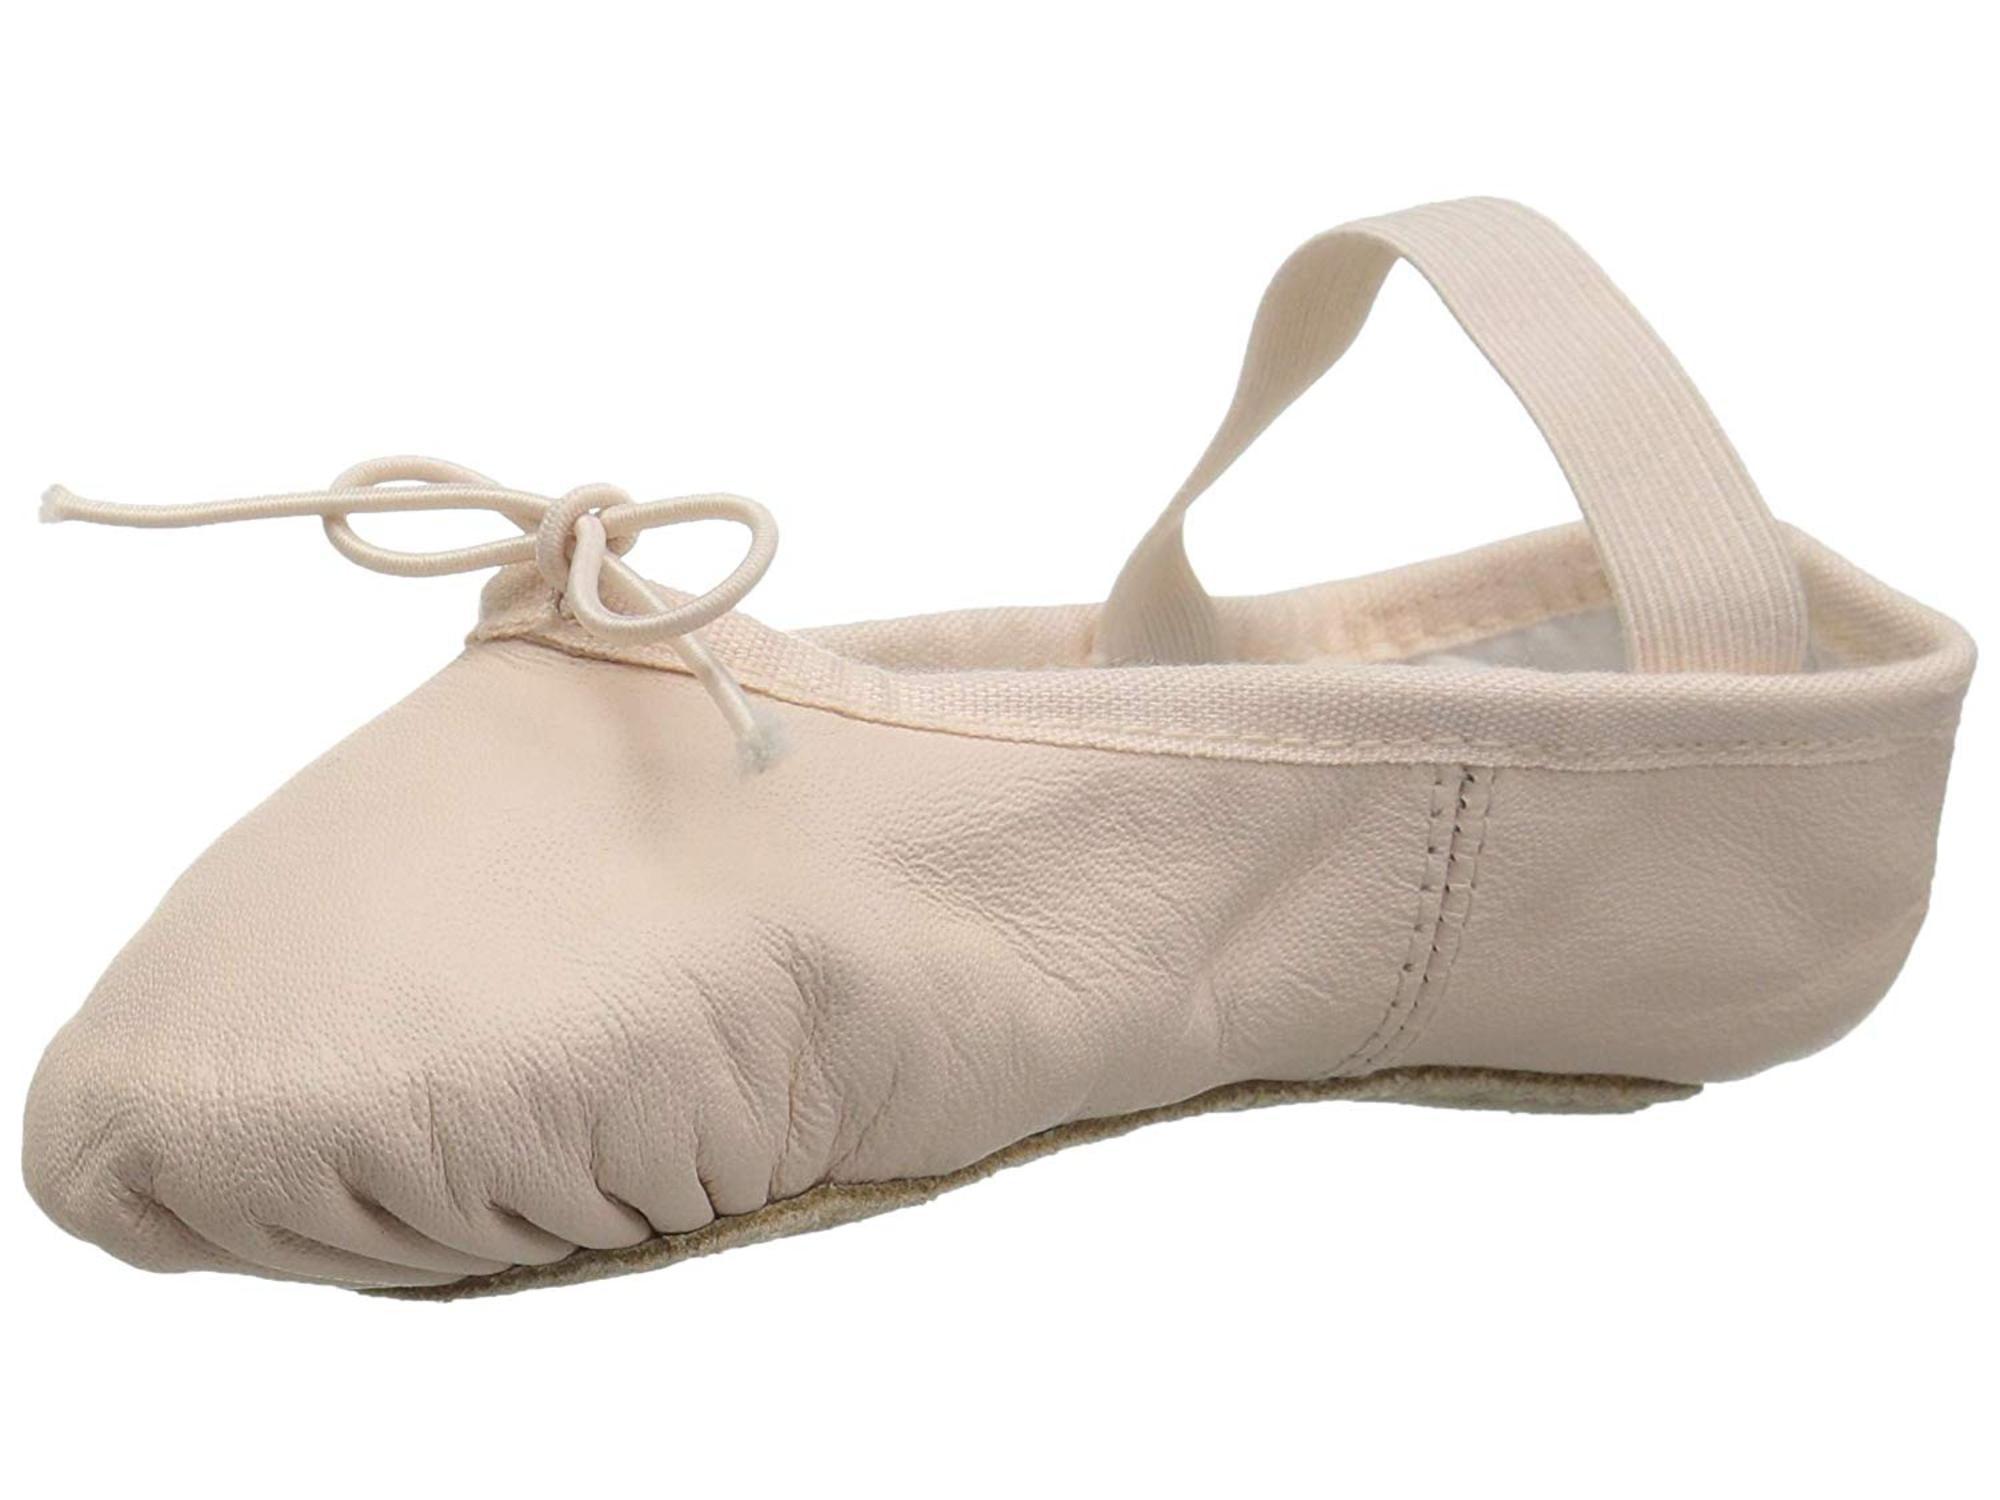 Child Girl/'s Bloch Dansoft Ballet Dance Shoes Black Leather MANY SIZES New!